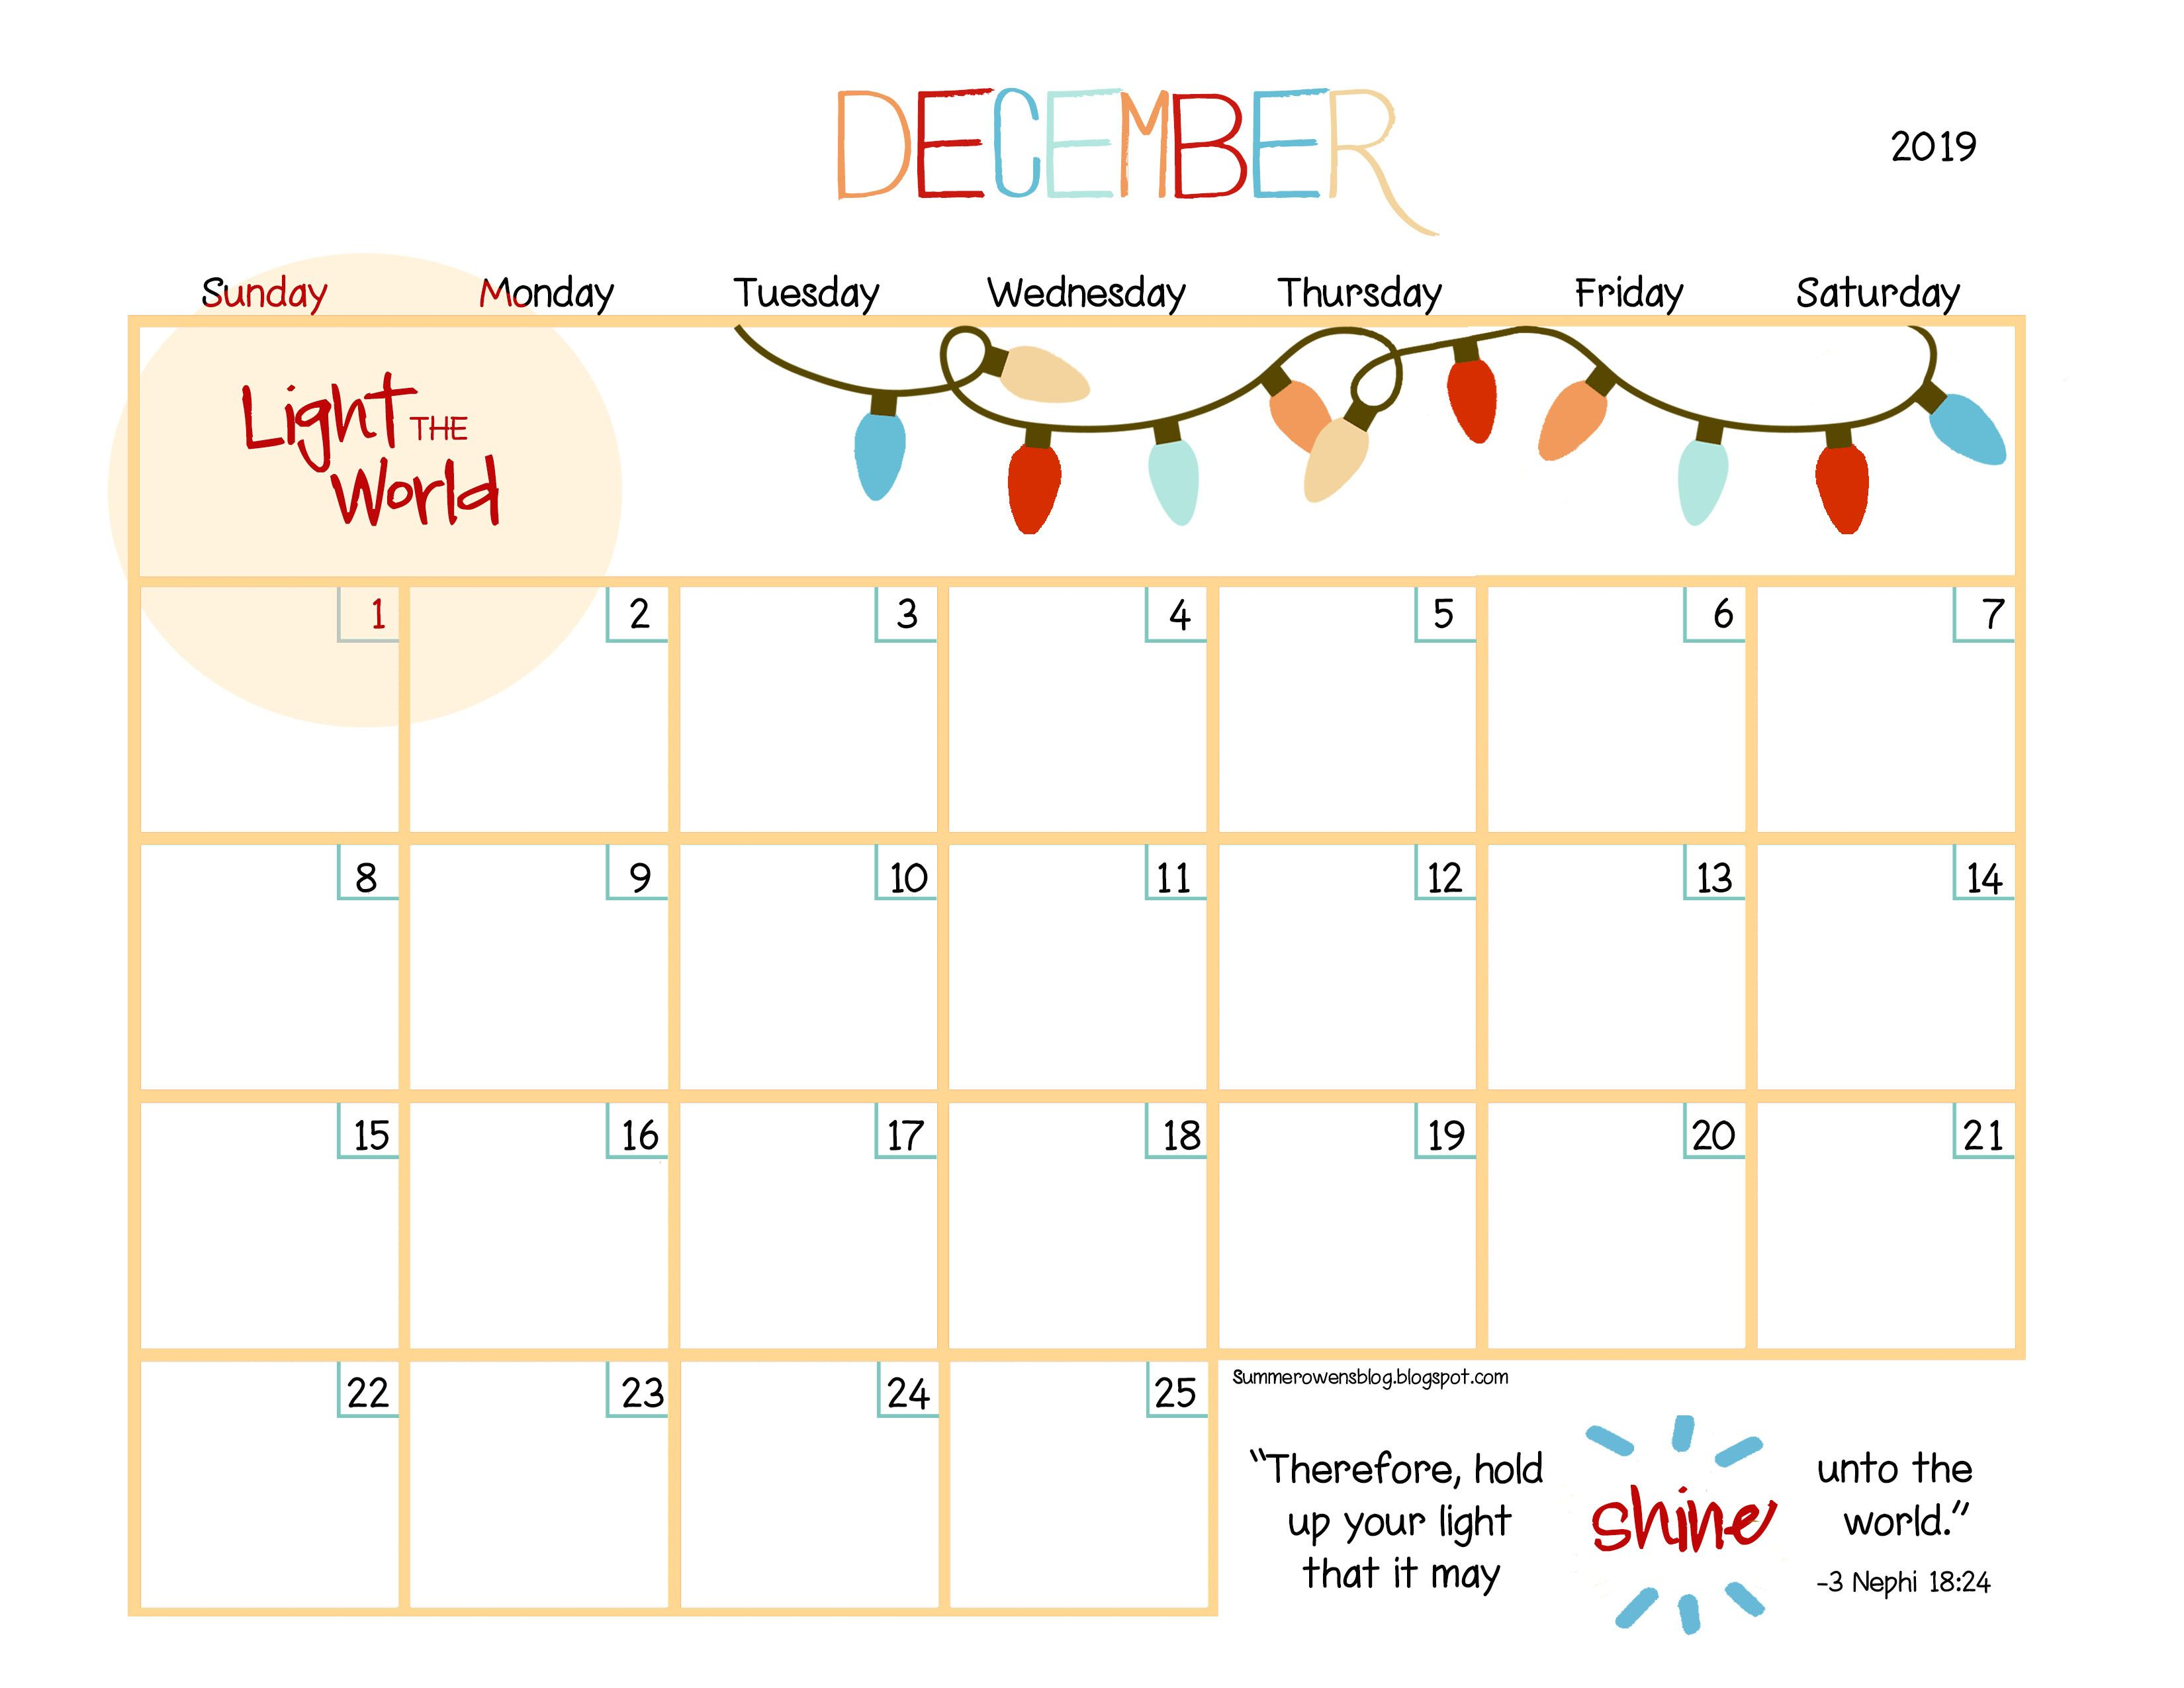 Light the World One by One December 2019 Customizable Calendar